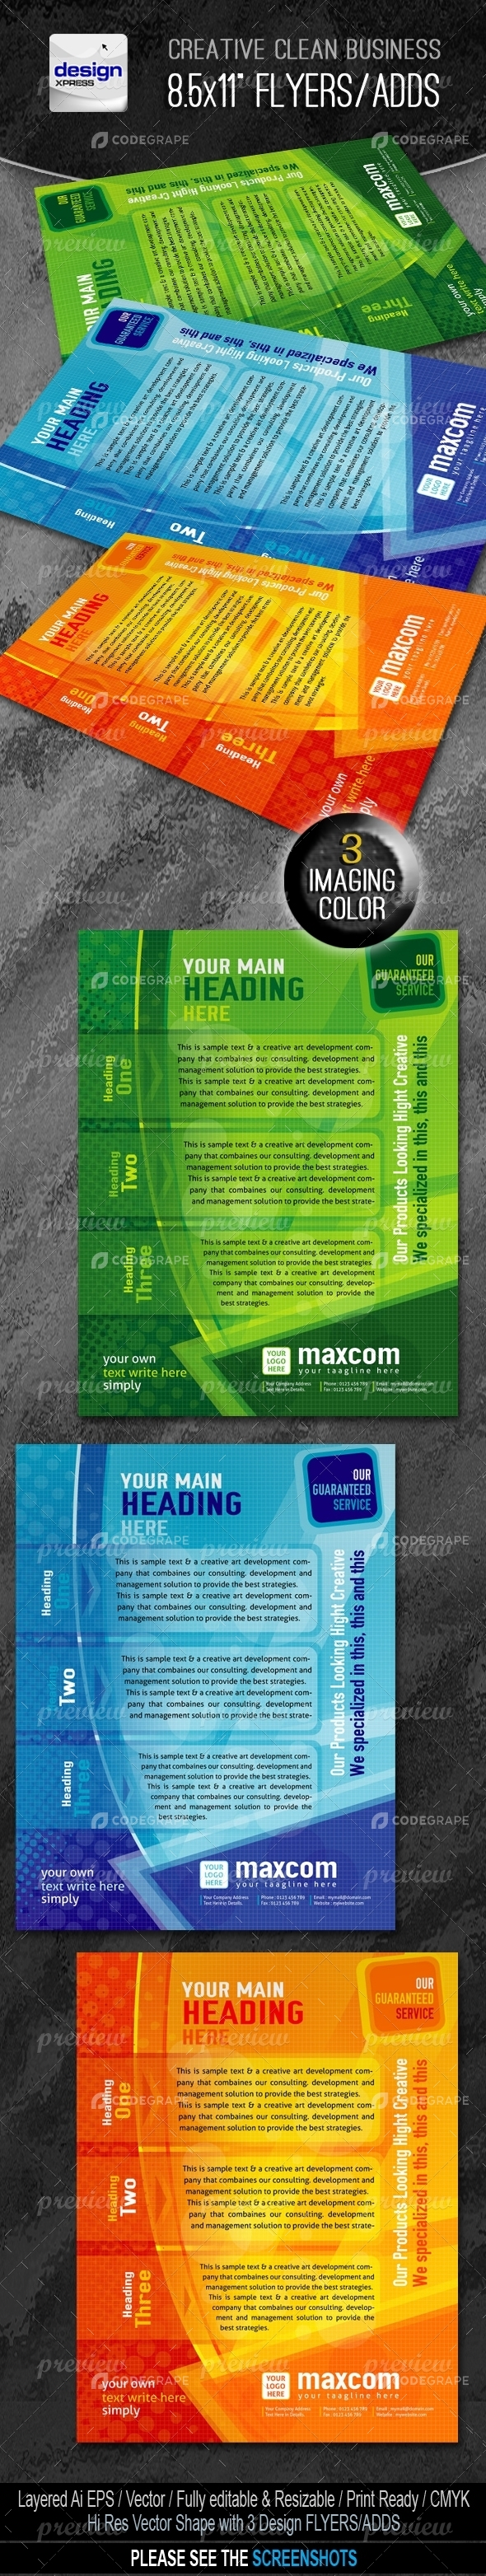 Maxcom Flyers/Adds